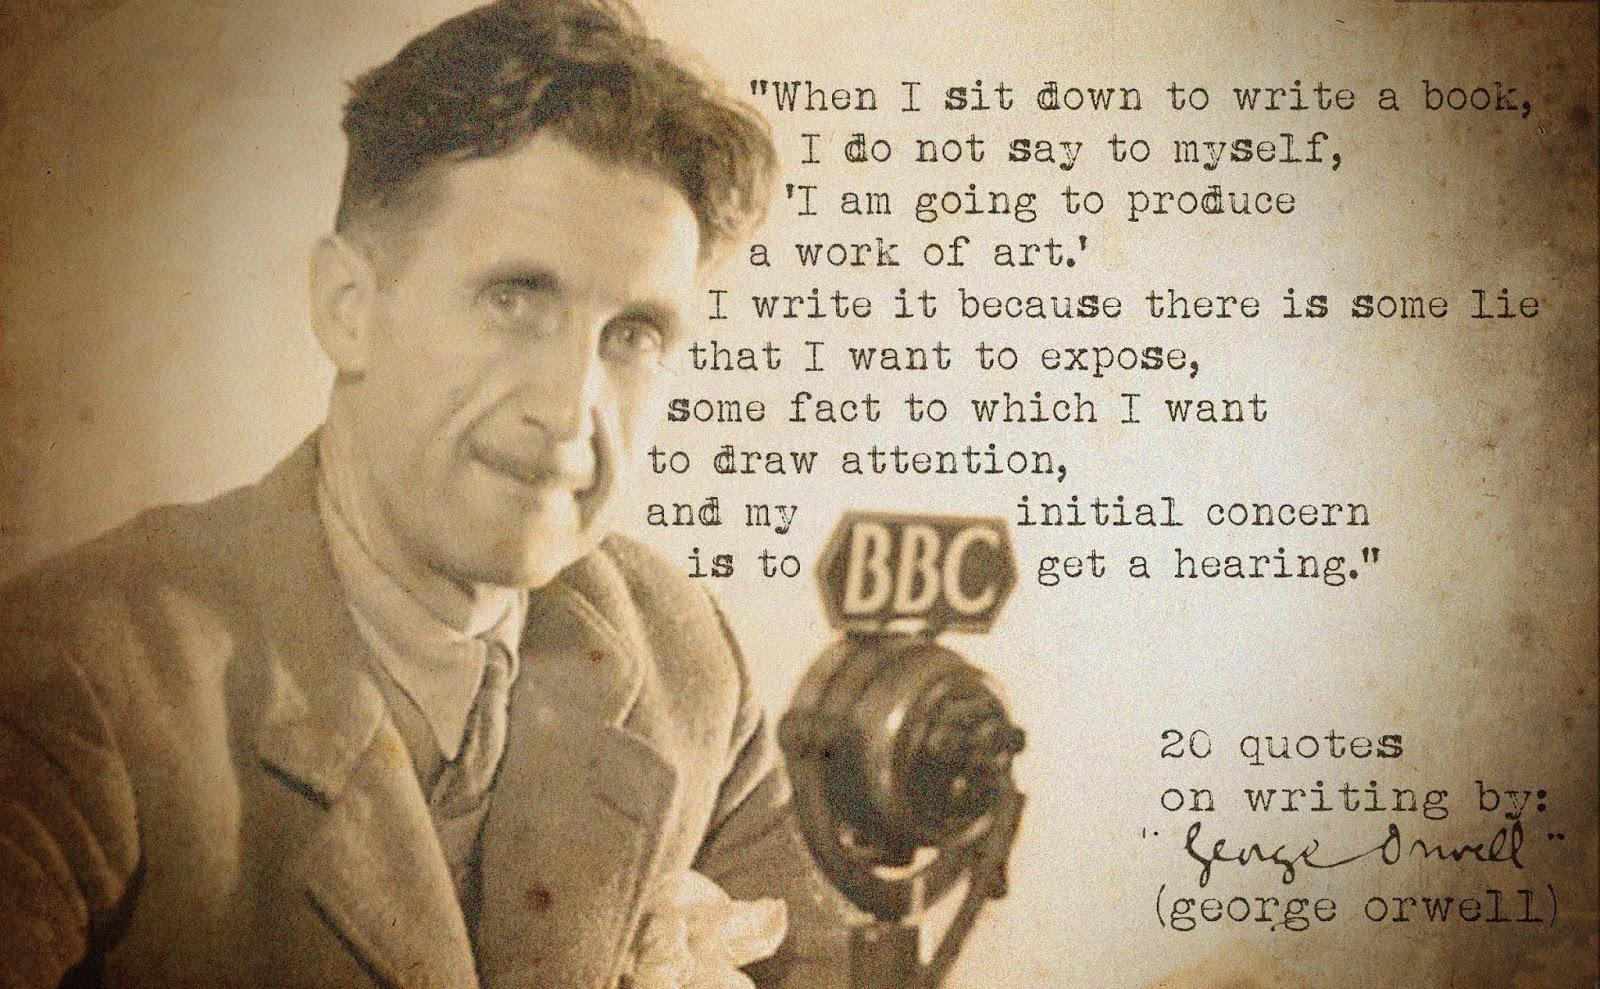 orwell essay on writing george orwell essay on writing